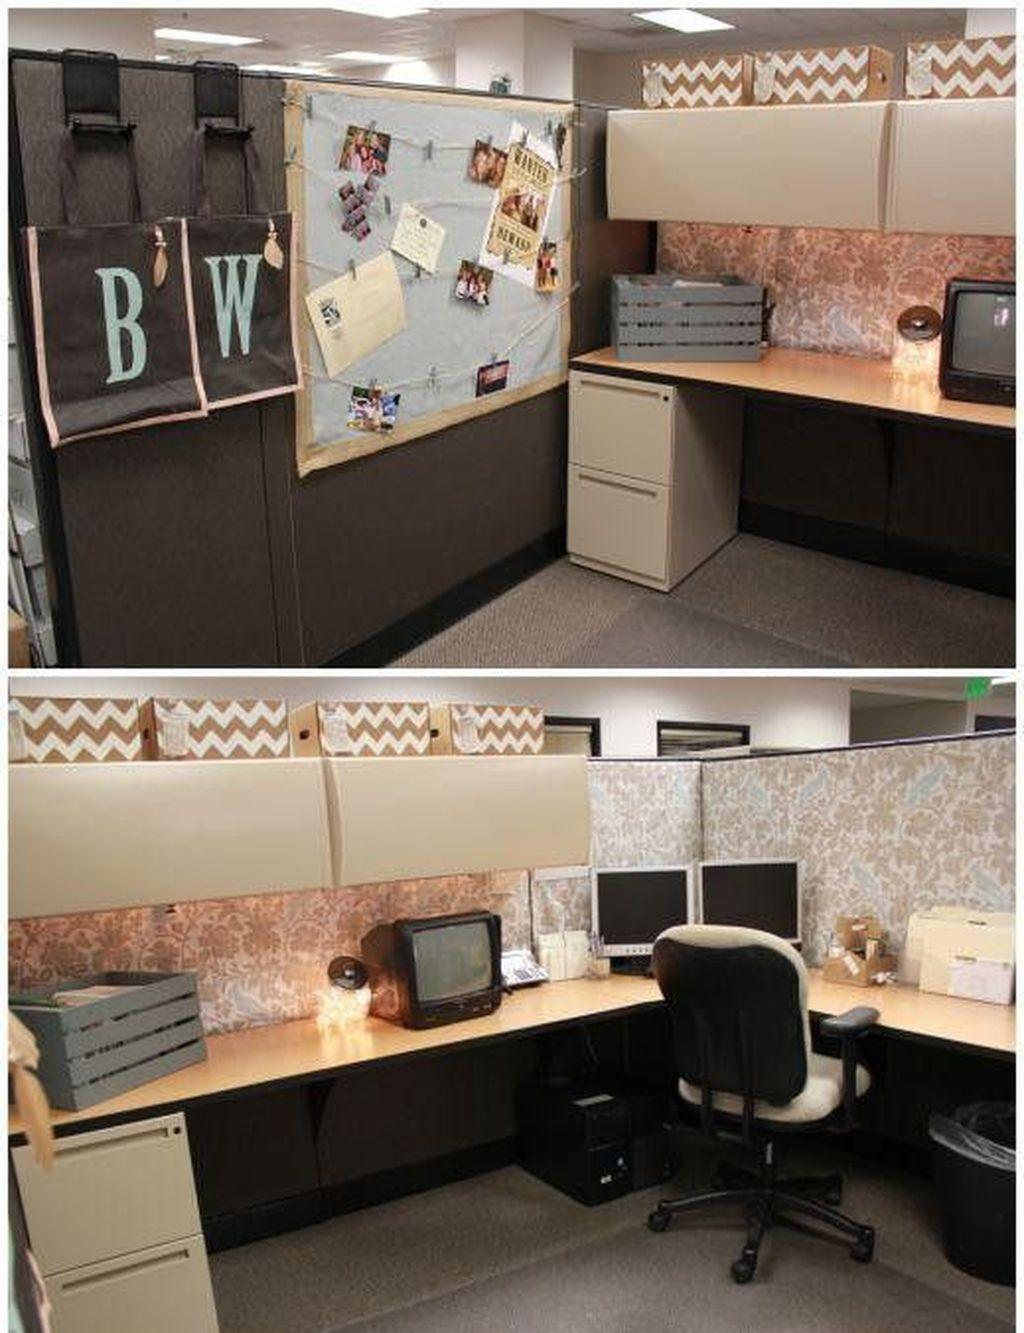 46 Inspiring Office Cubicle Decoration Ideas Cubicle Decor